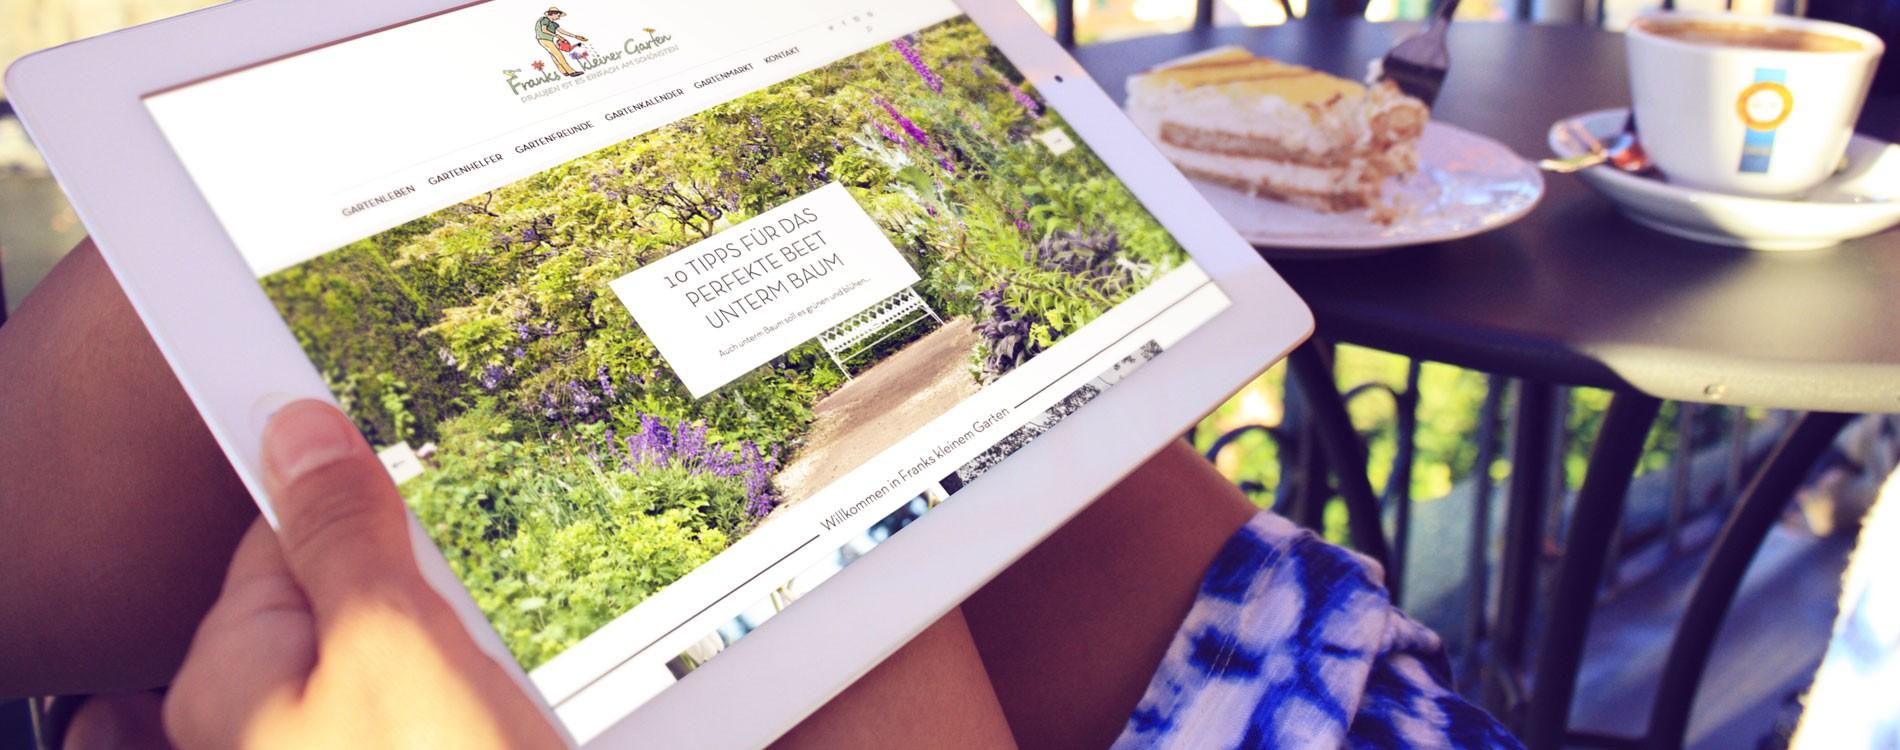 404MEDIA Projekt - Franks kleiner Garten